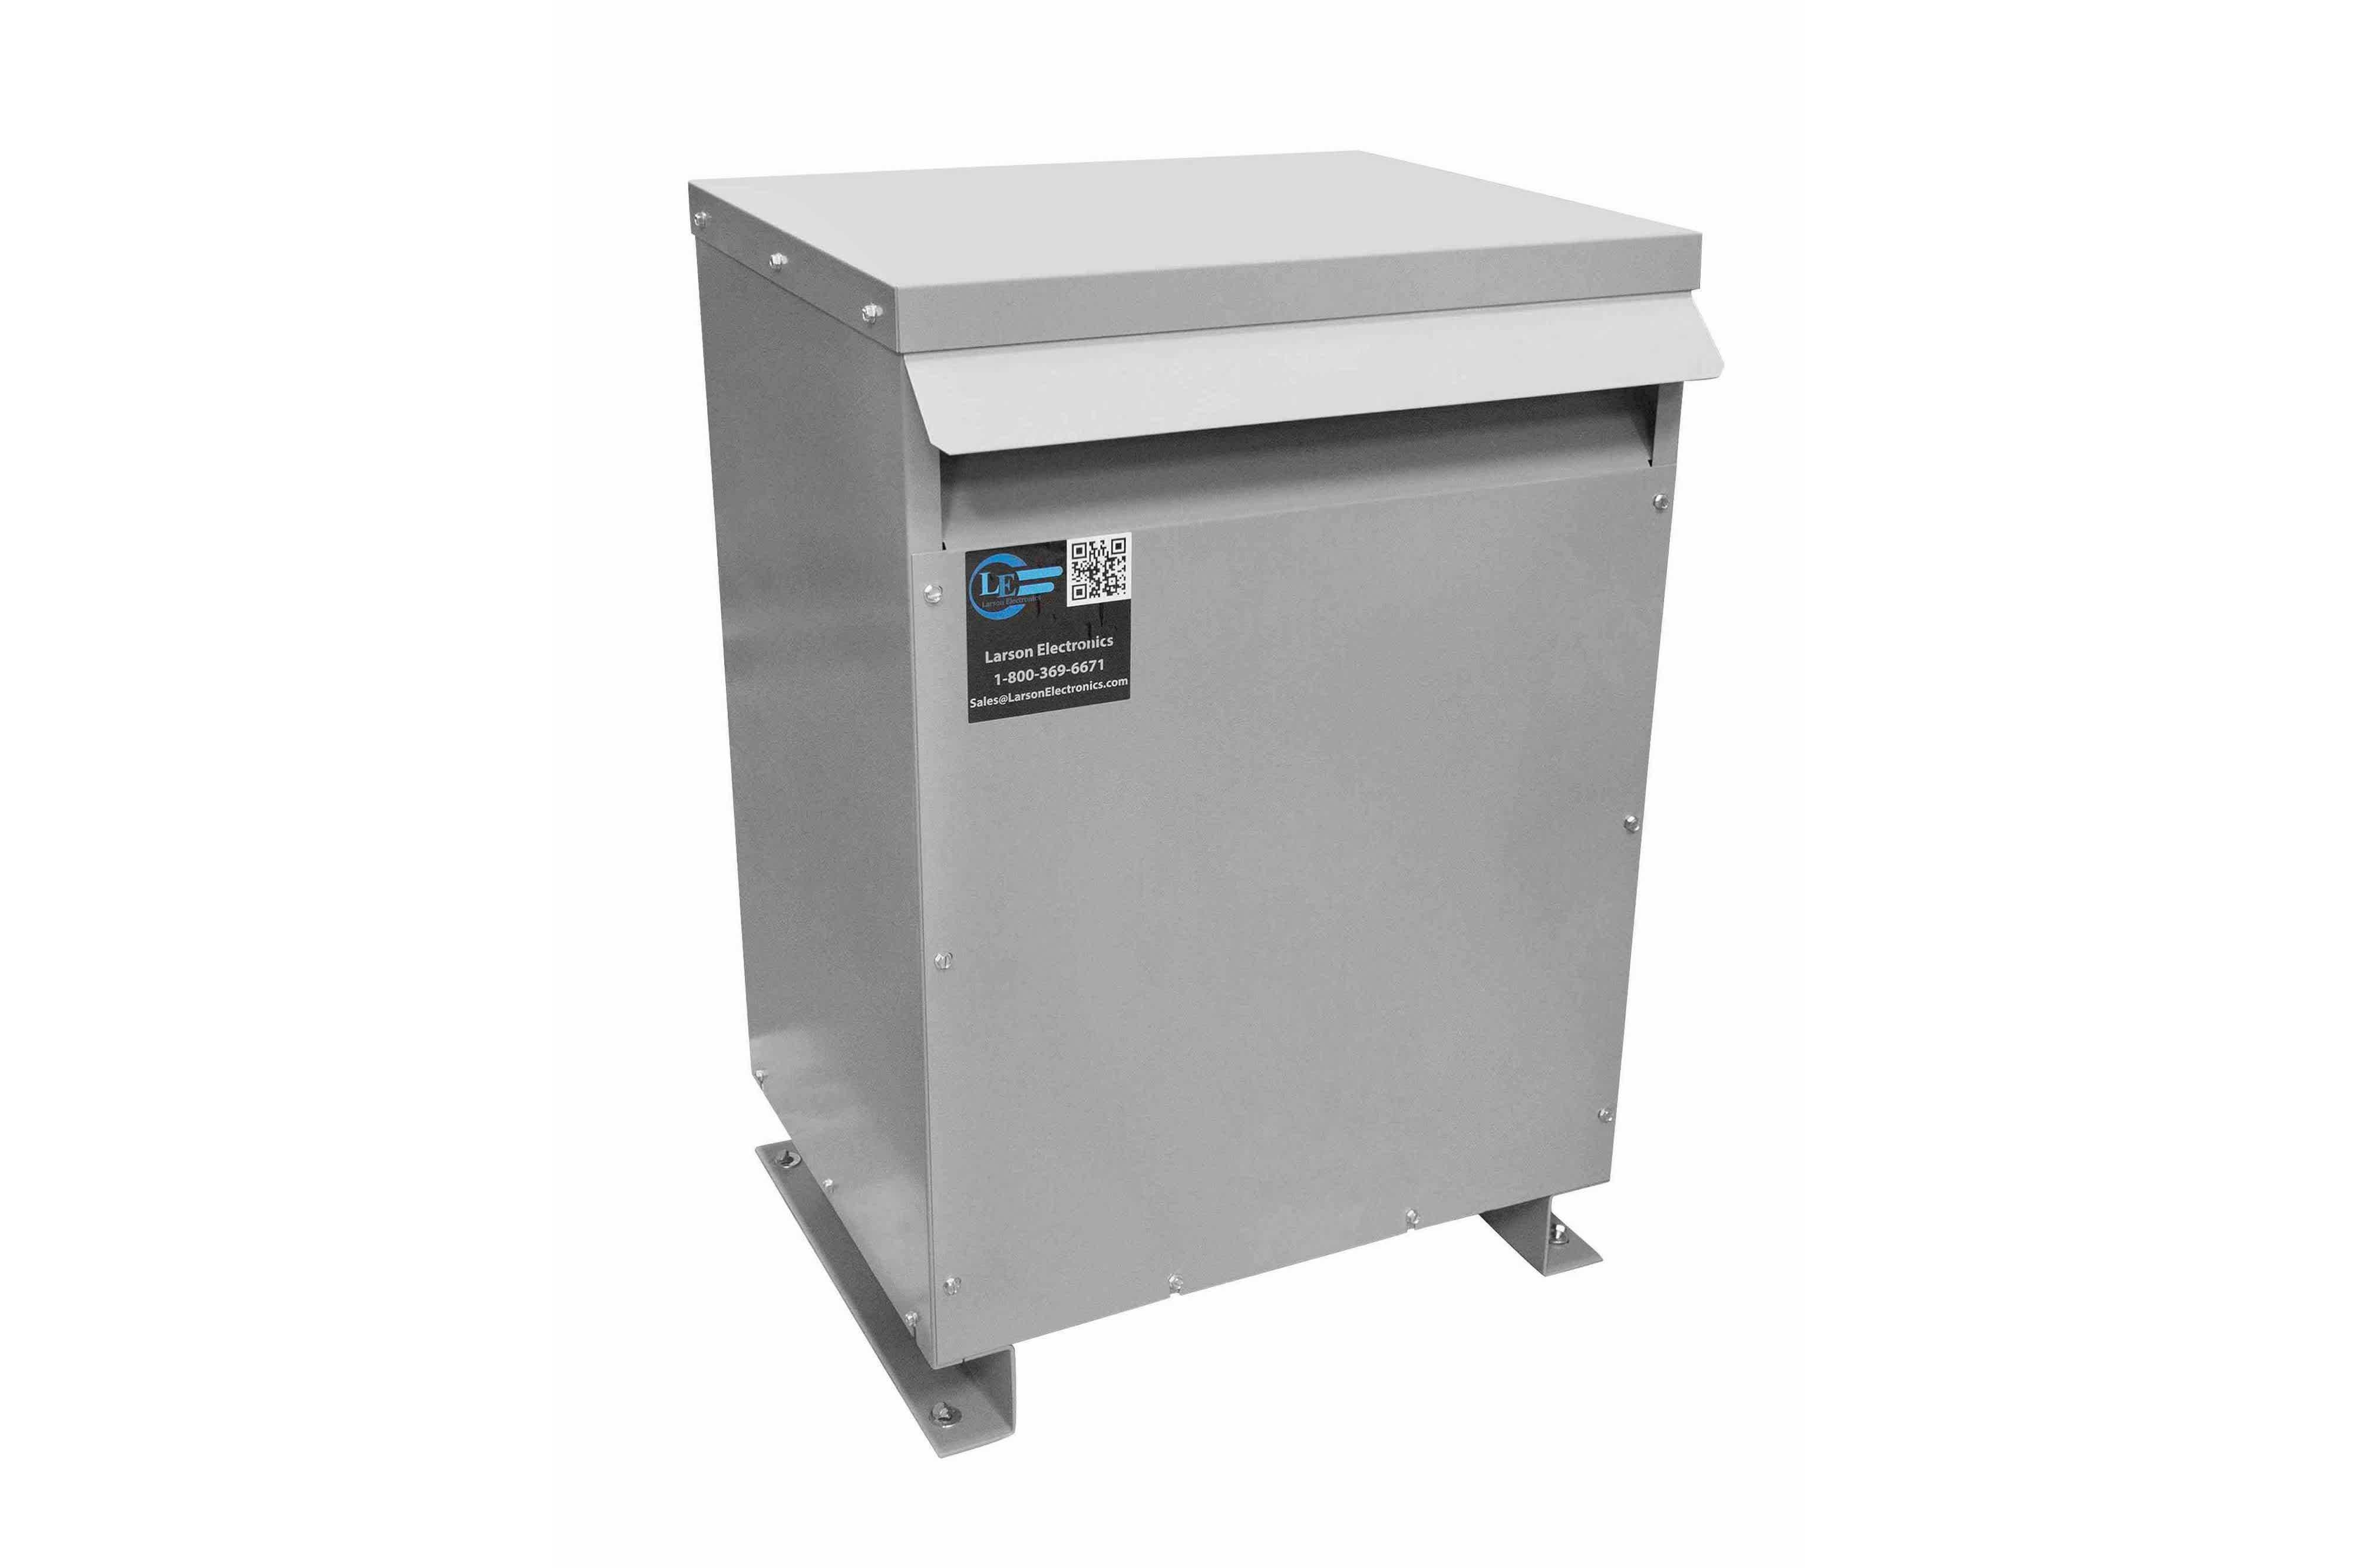 13 kVA 3PH Isolation Transformer, 415V Wye Primary, 600V Delta Secondary, N3R, Ventilated, 60 Hz